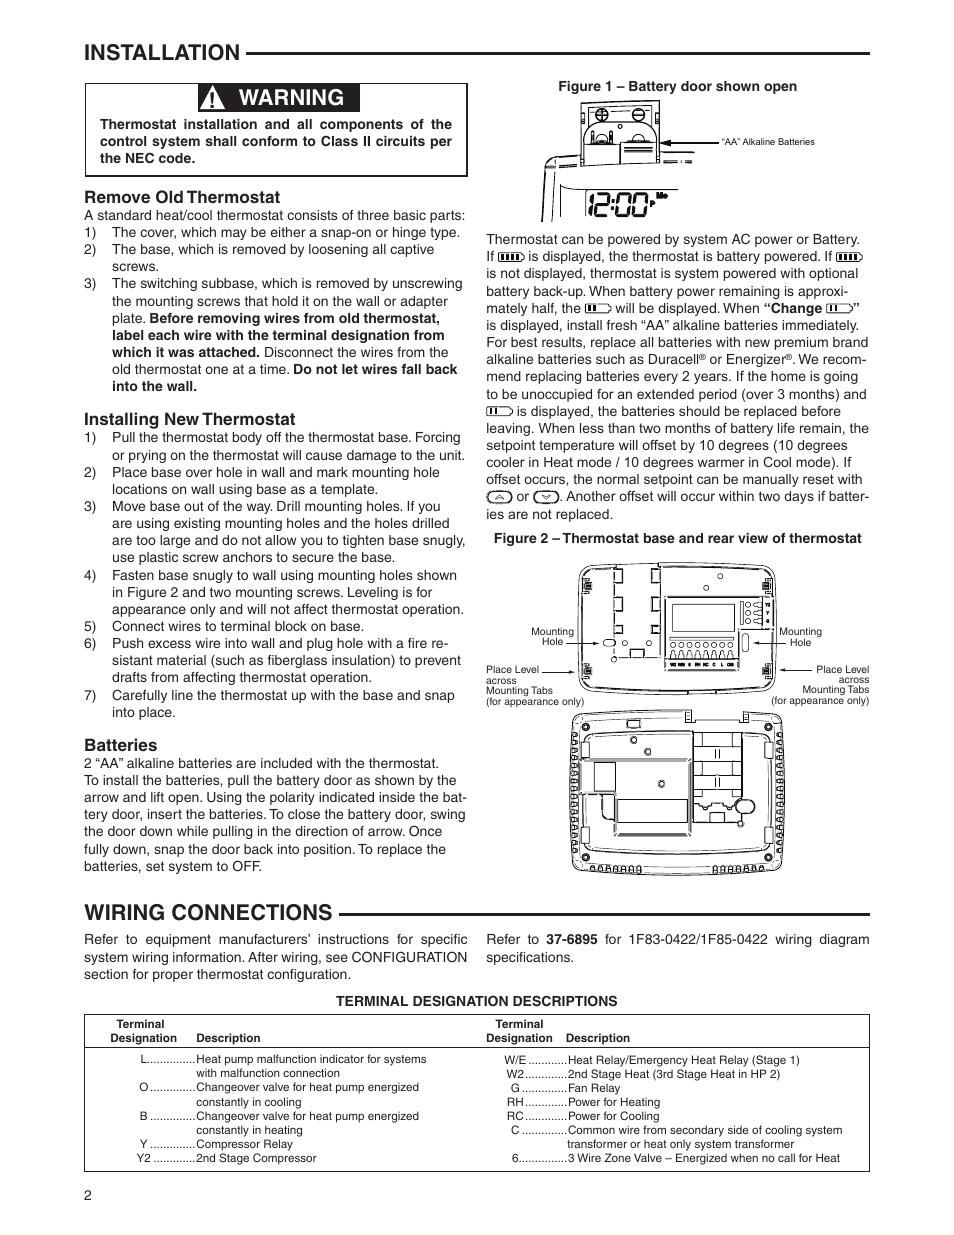 Oex Relay Wiring Diagram : Suburban rv water heater relay wiring diagram